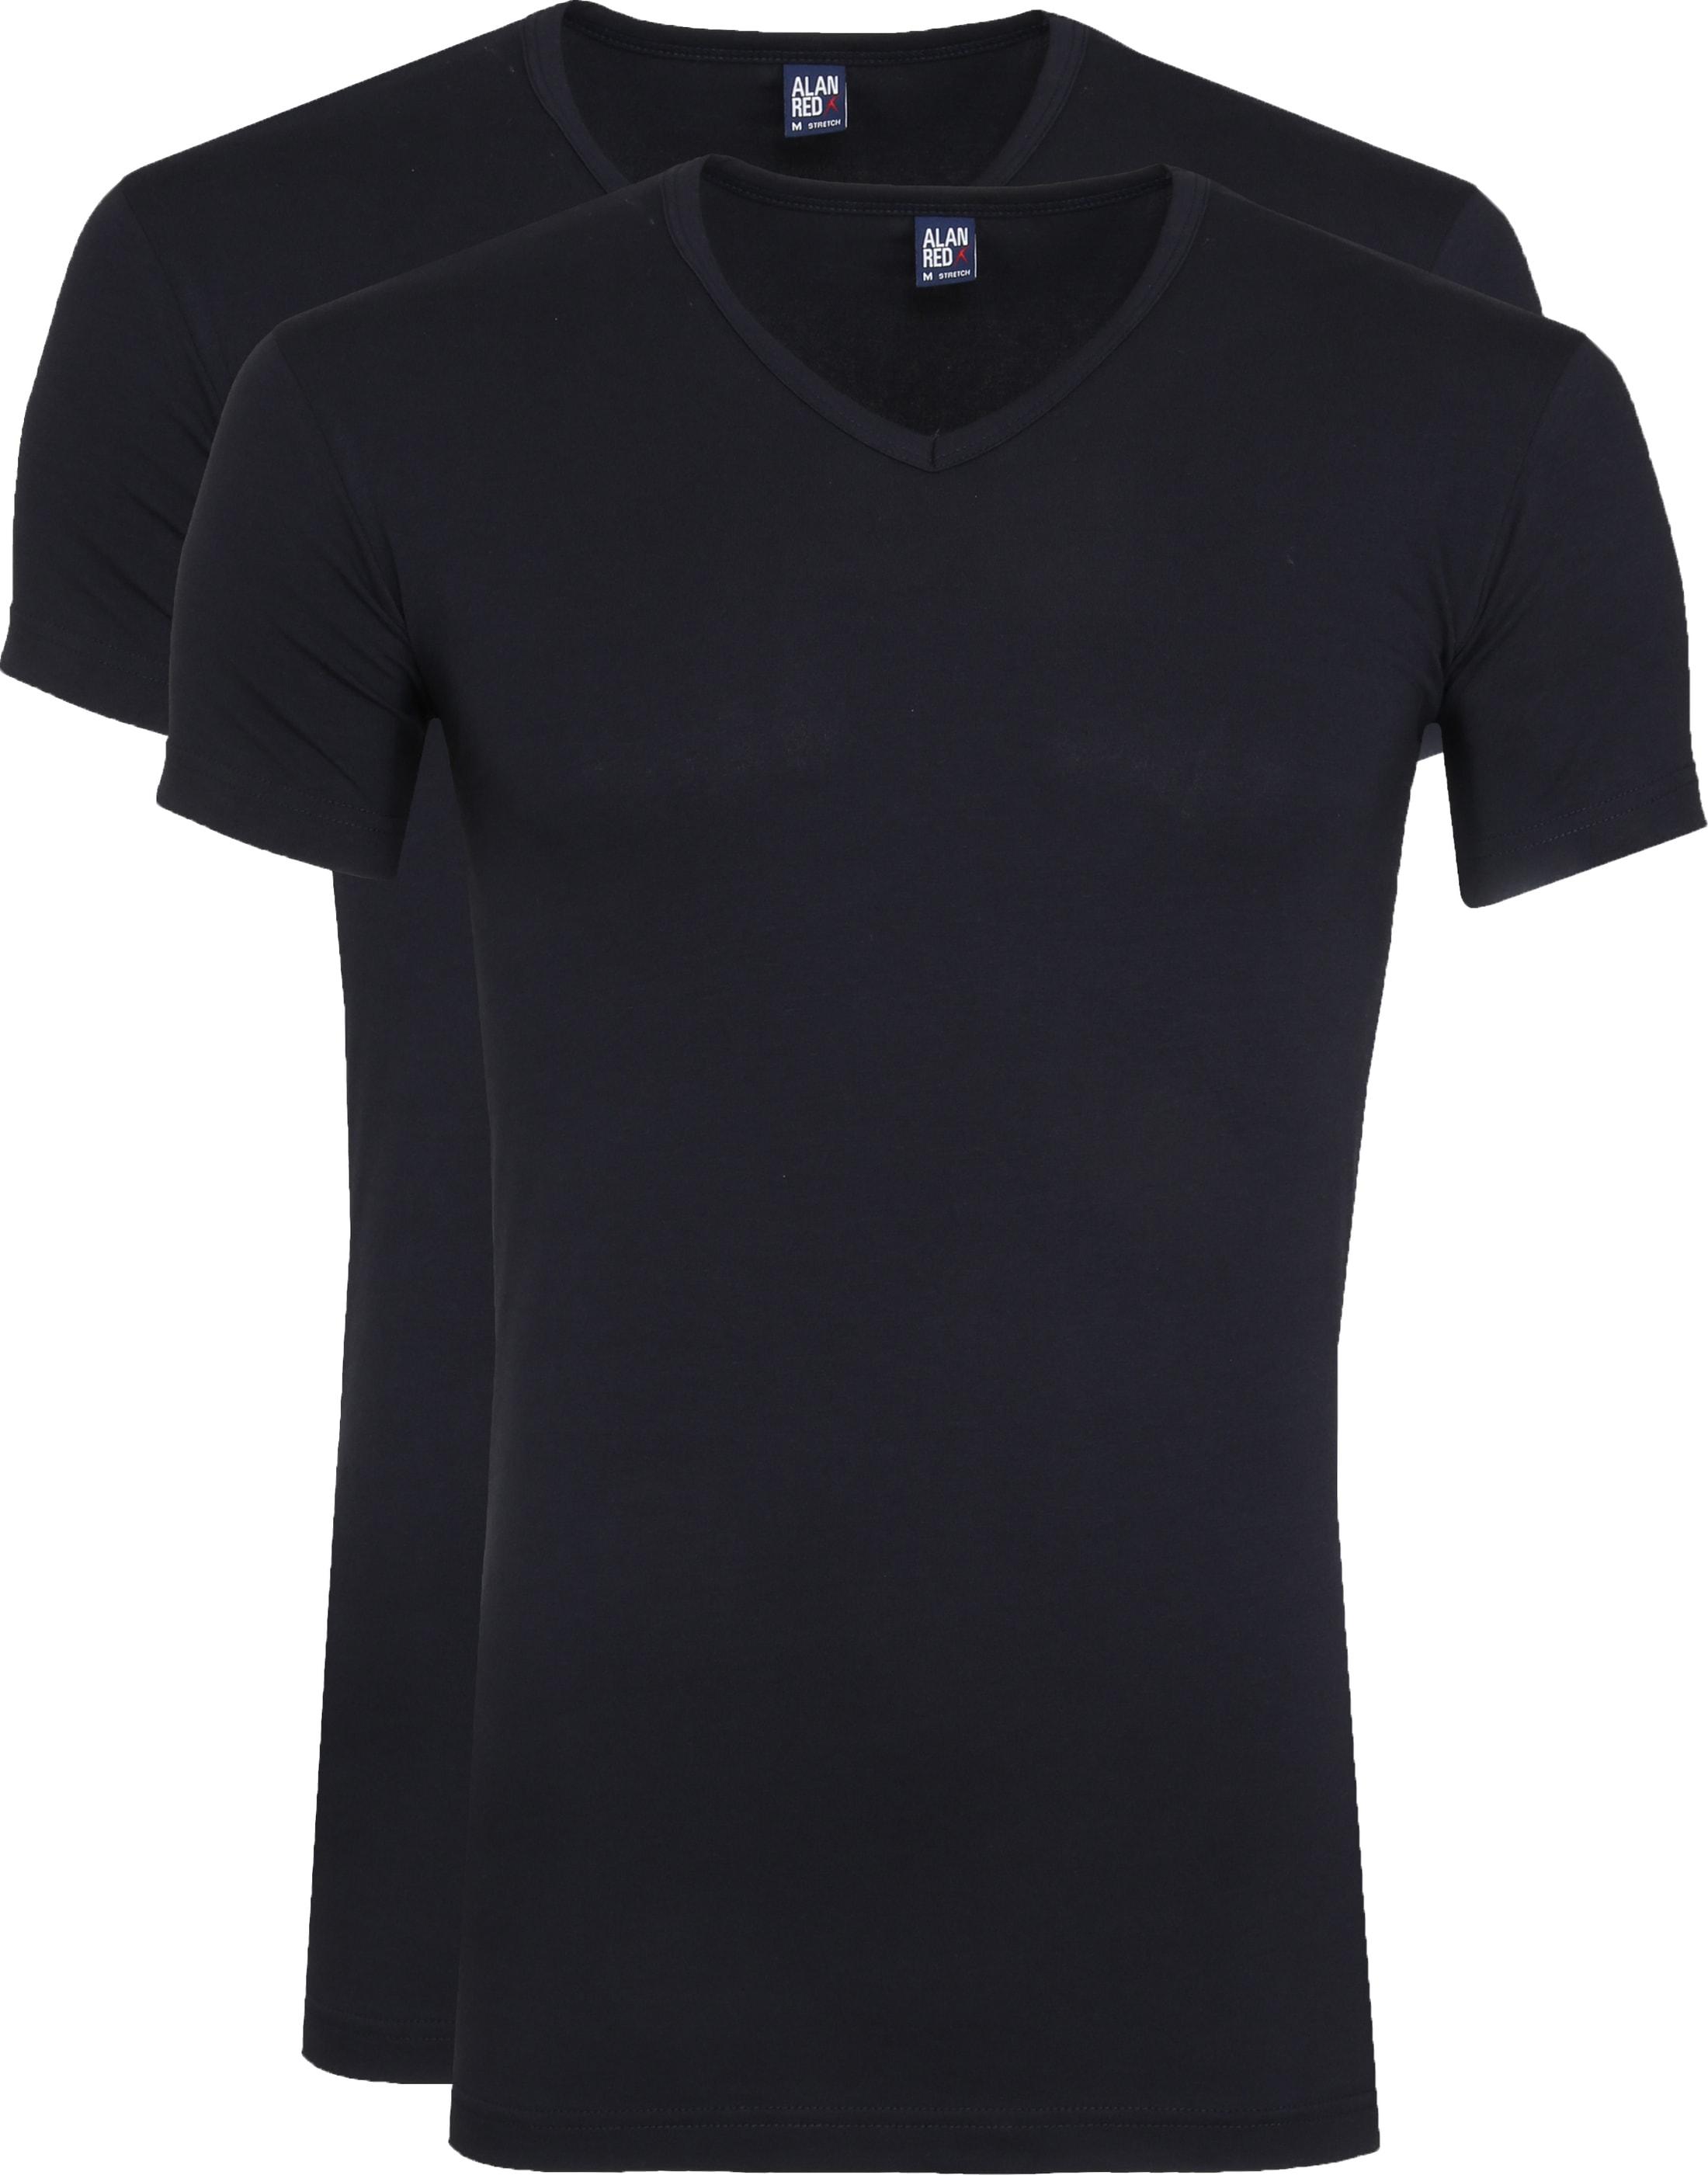 Alan Red Oklahoma T-Shirt Stretch Navy (2-Pack) foto 0